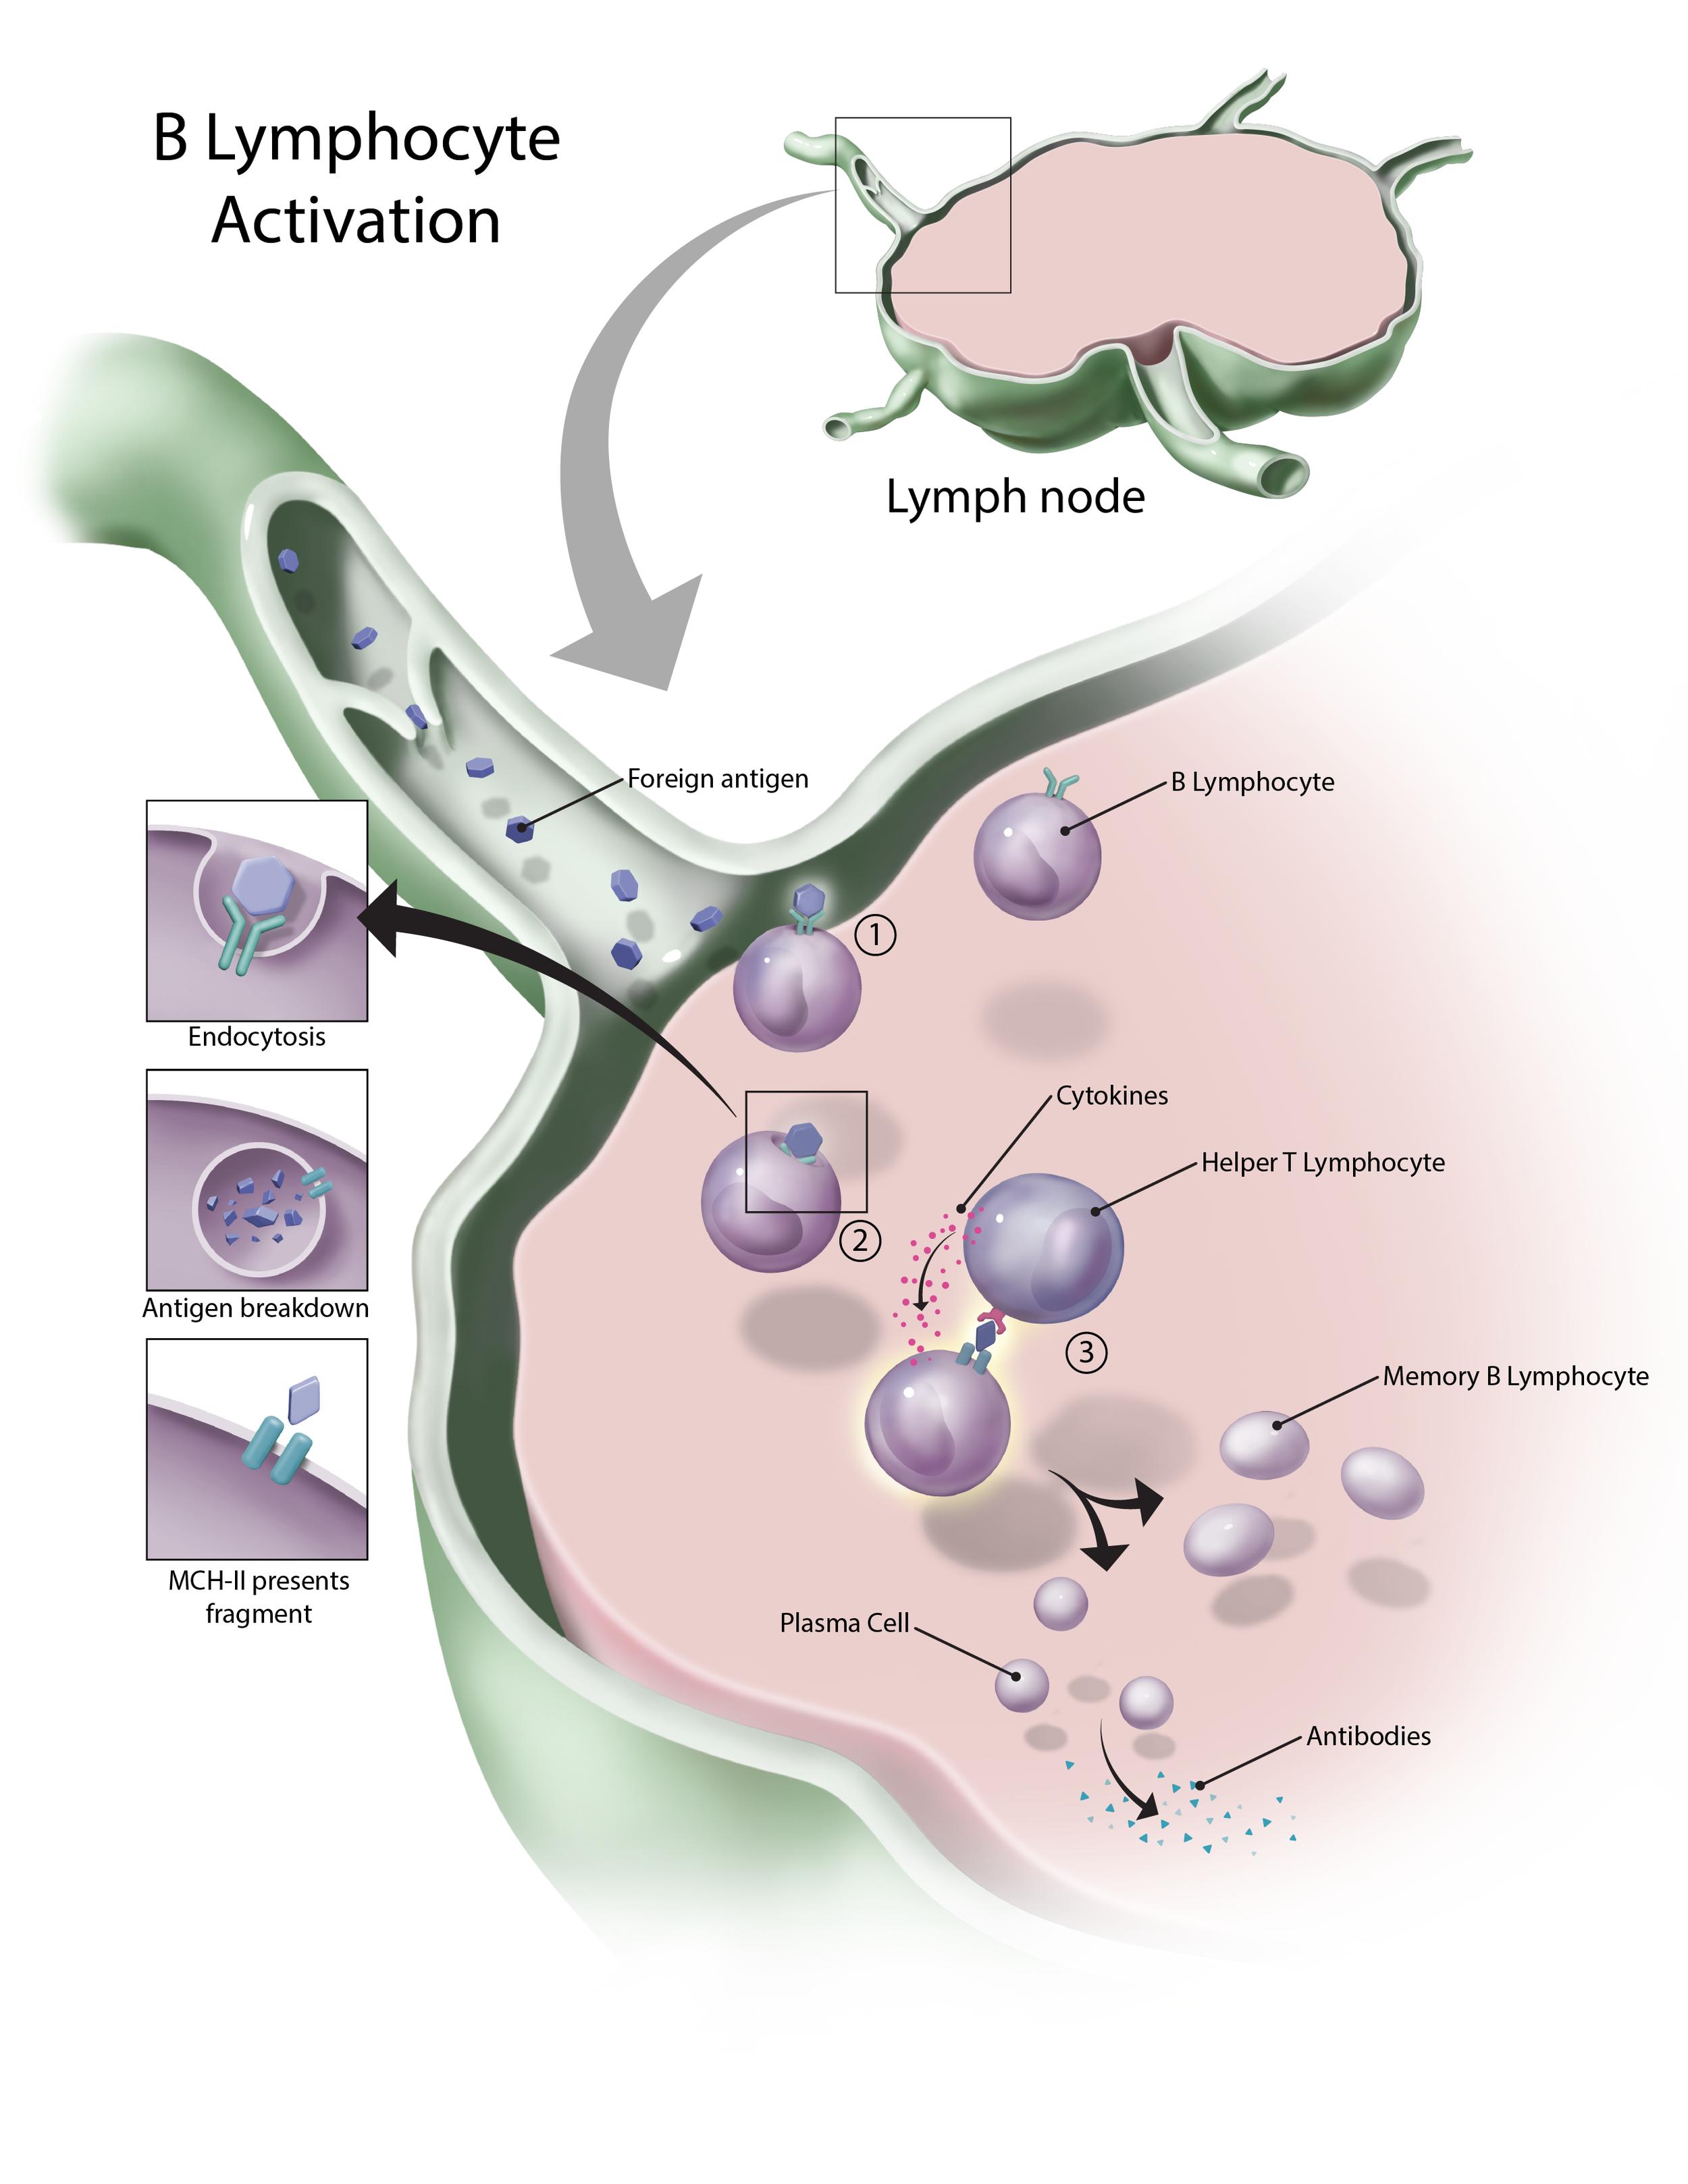 B Lymphocyte Activation